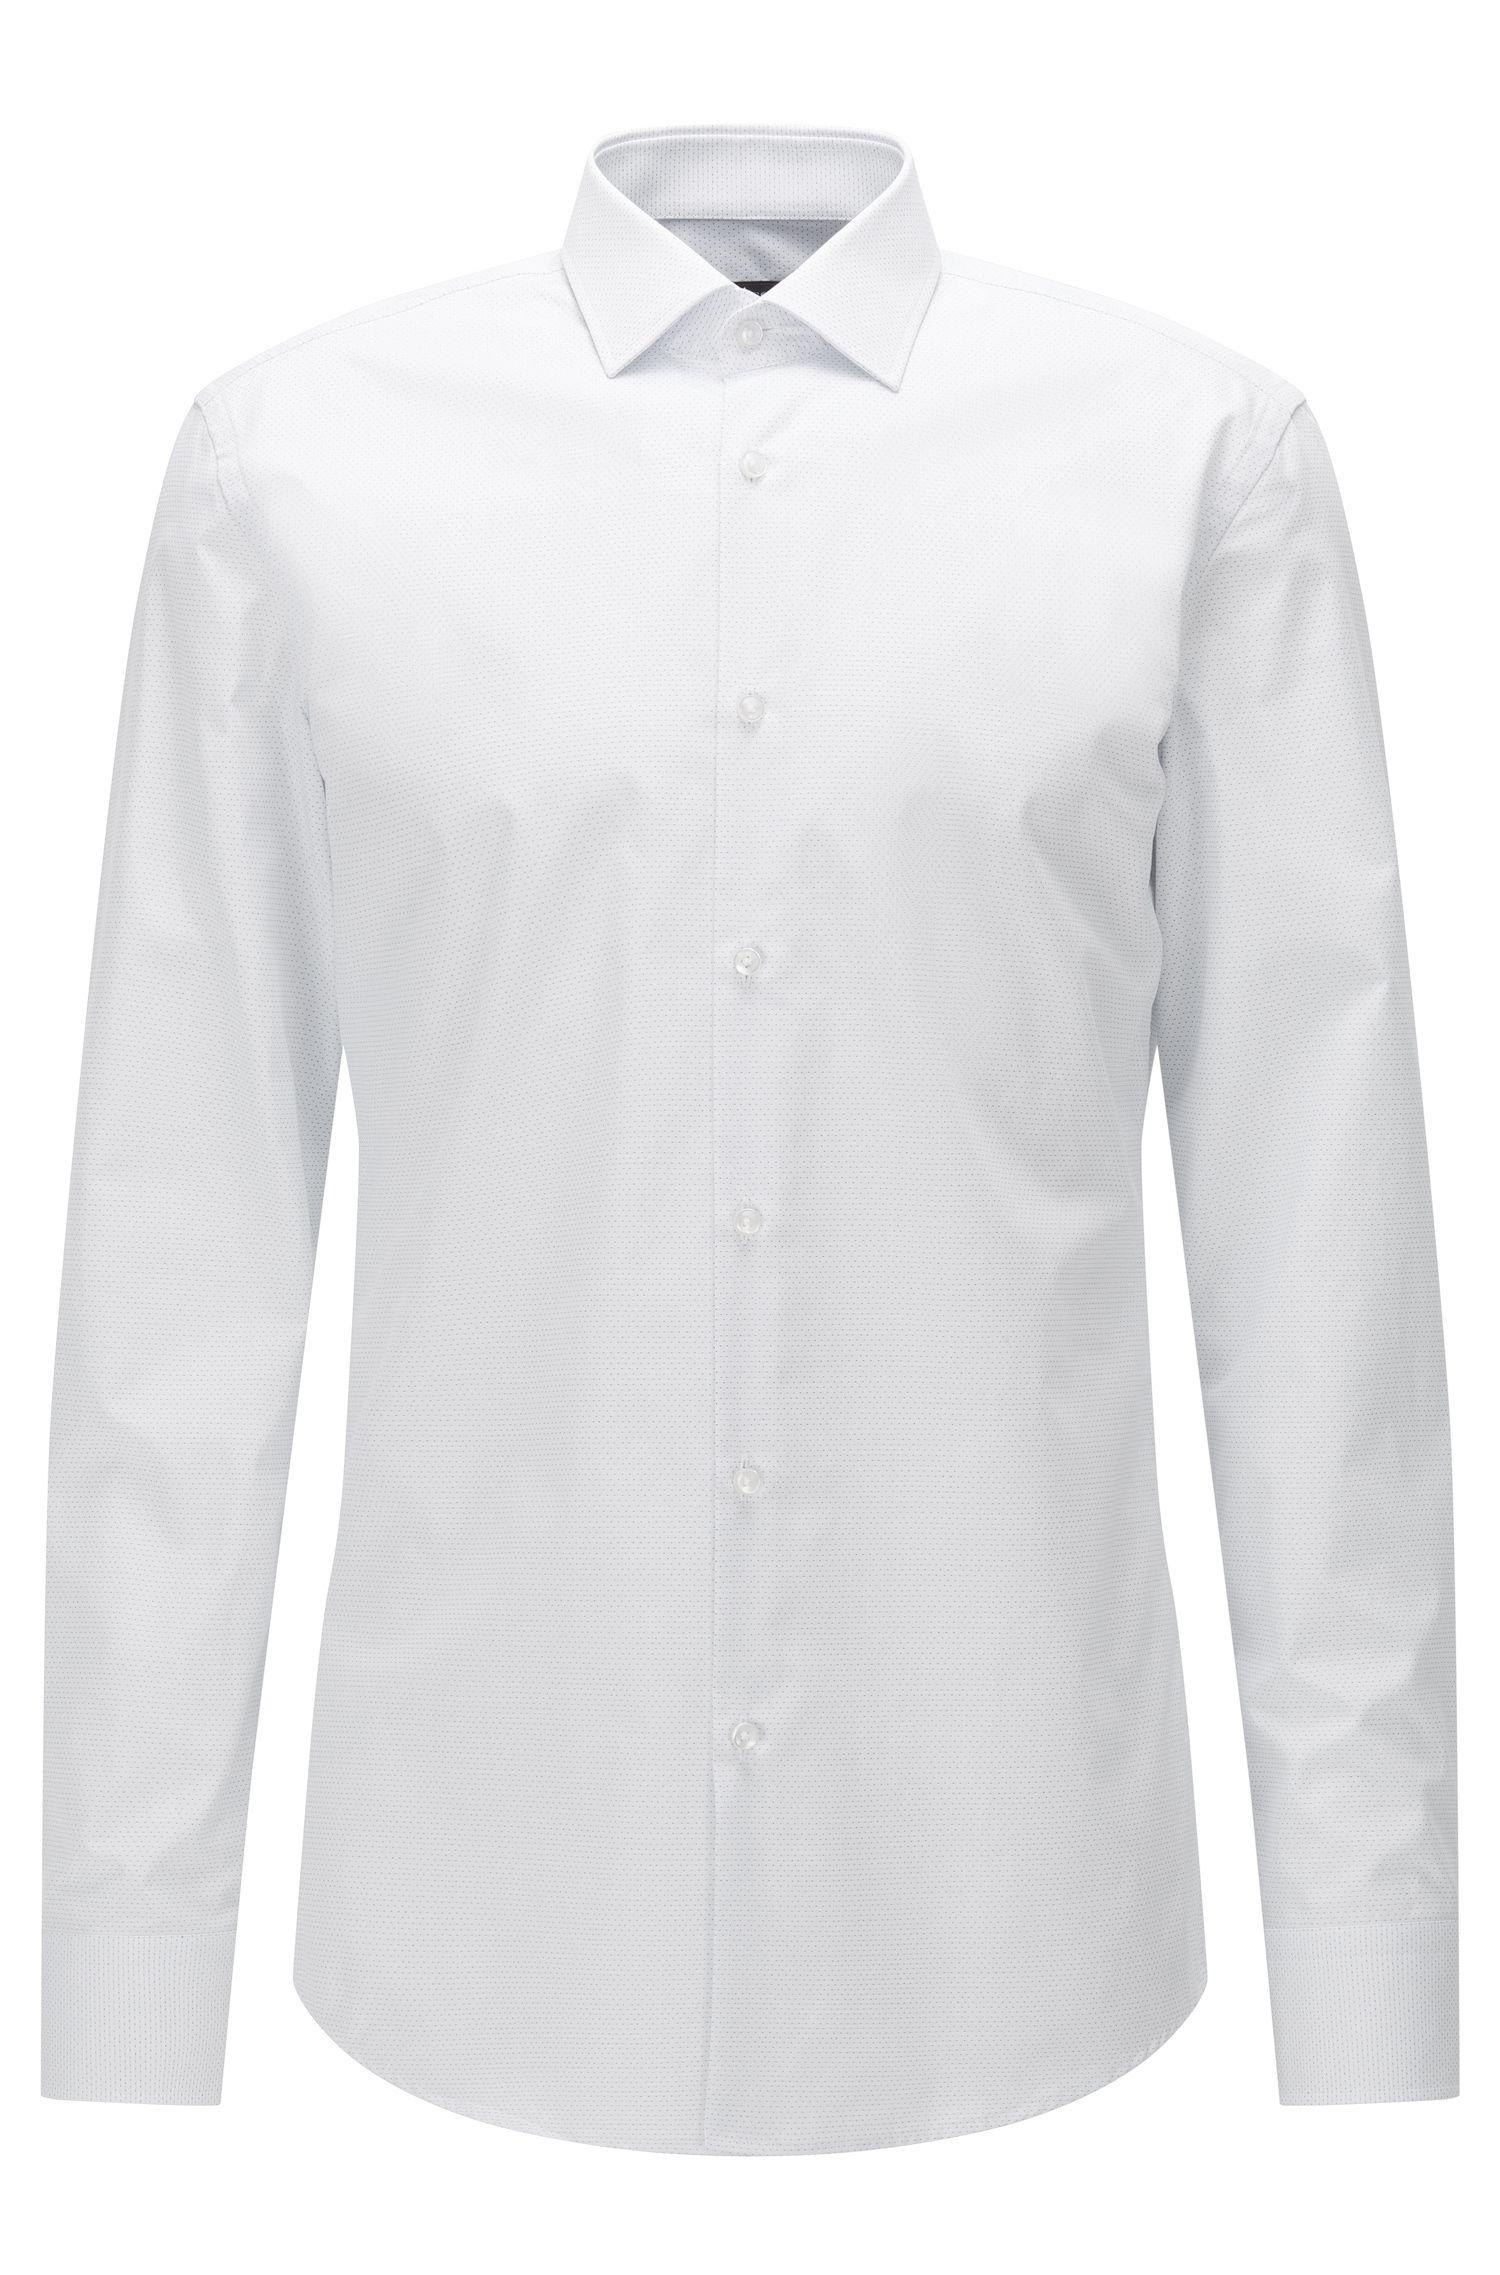 Slim-fit shirt in micro-dot cotton poplin